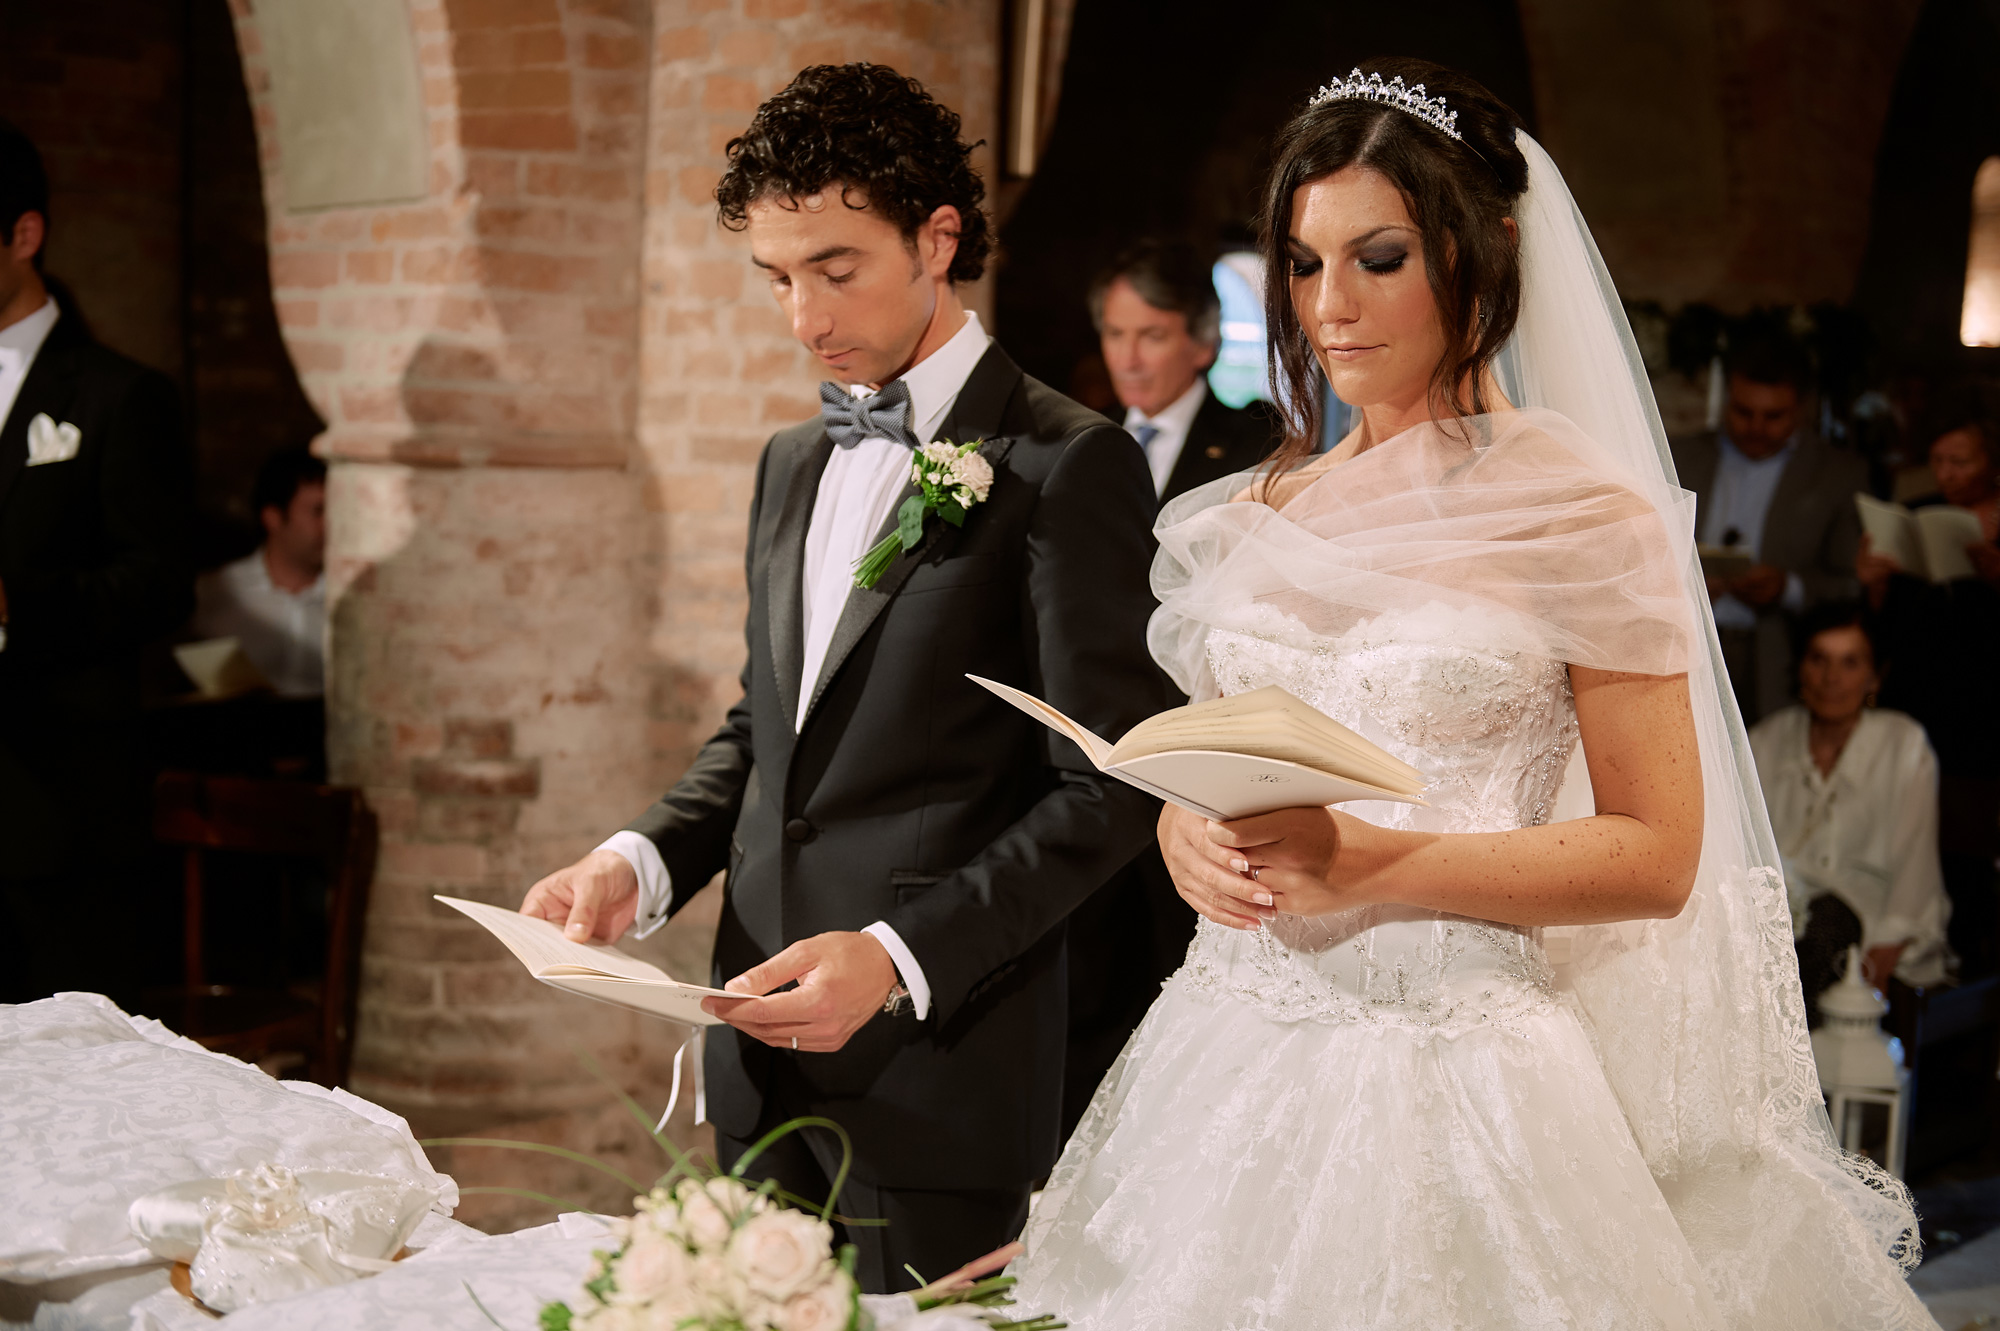 11b - ivano_di_maria_fotografo_matrimonio_ eli_franc